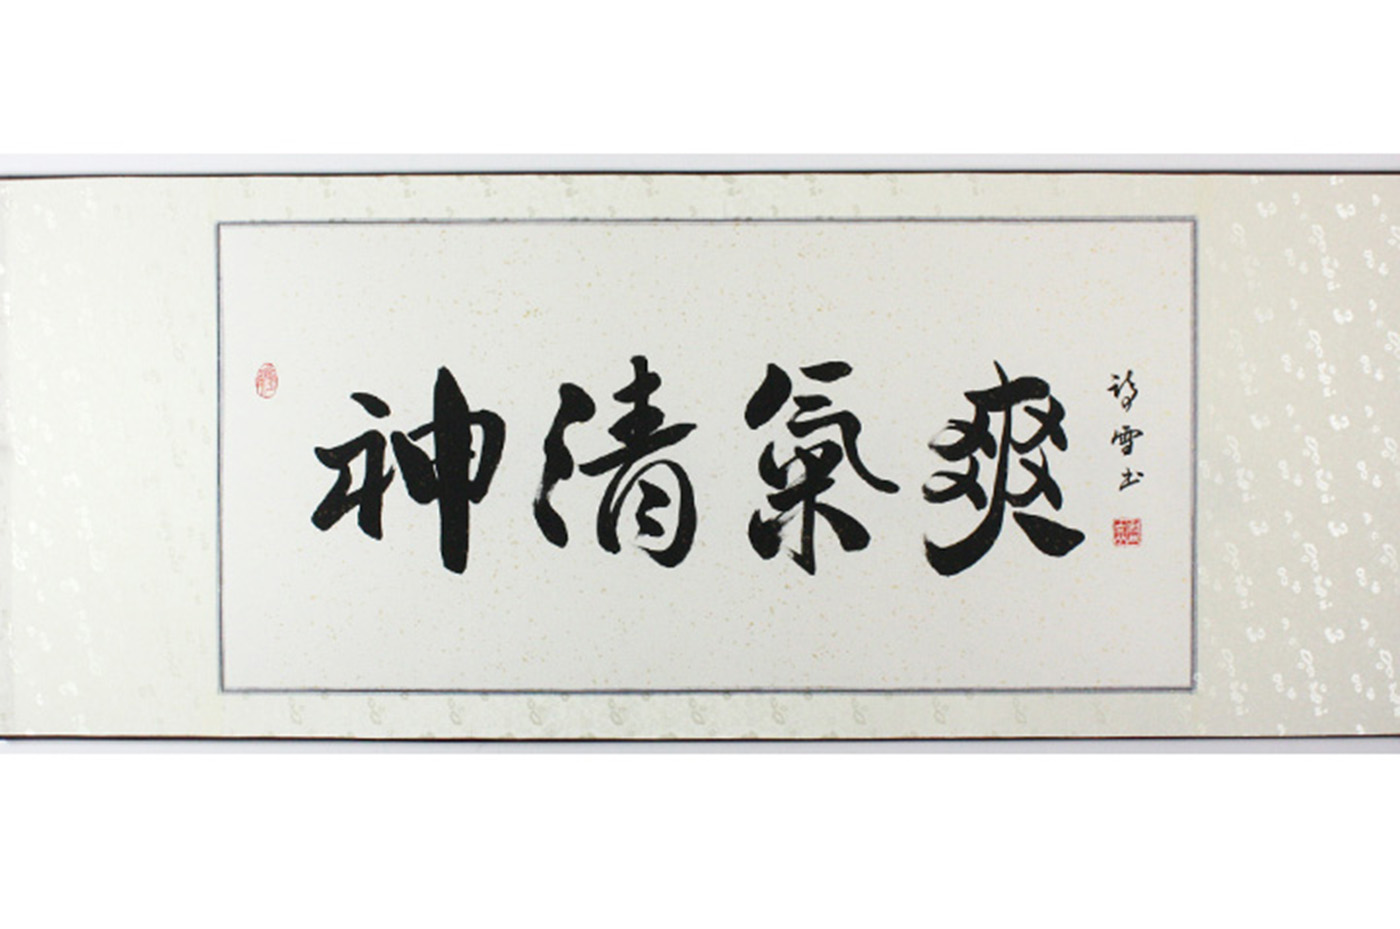 Calligraphie Humeur